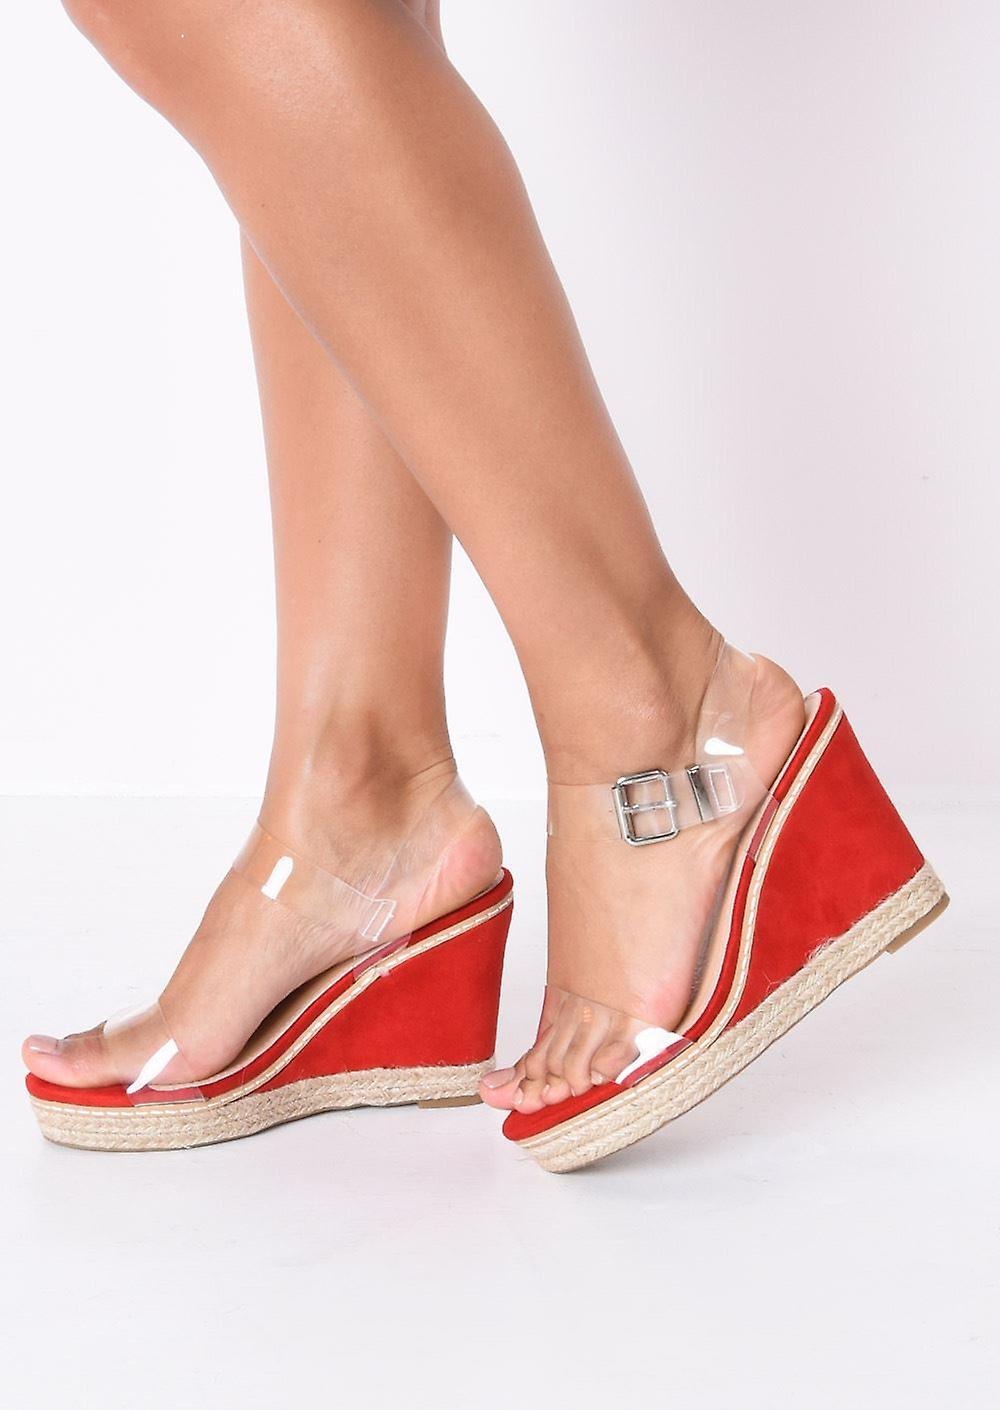 9edd21fbb03 Perspex Platform Espadrille Wedge Sandals Suede Red